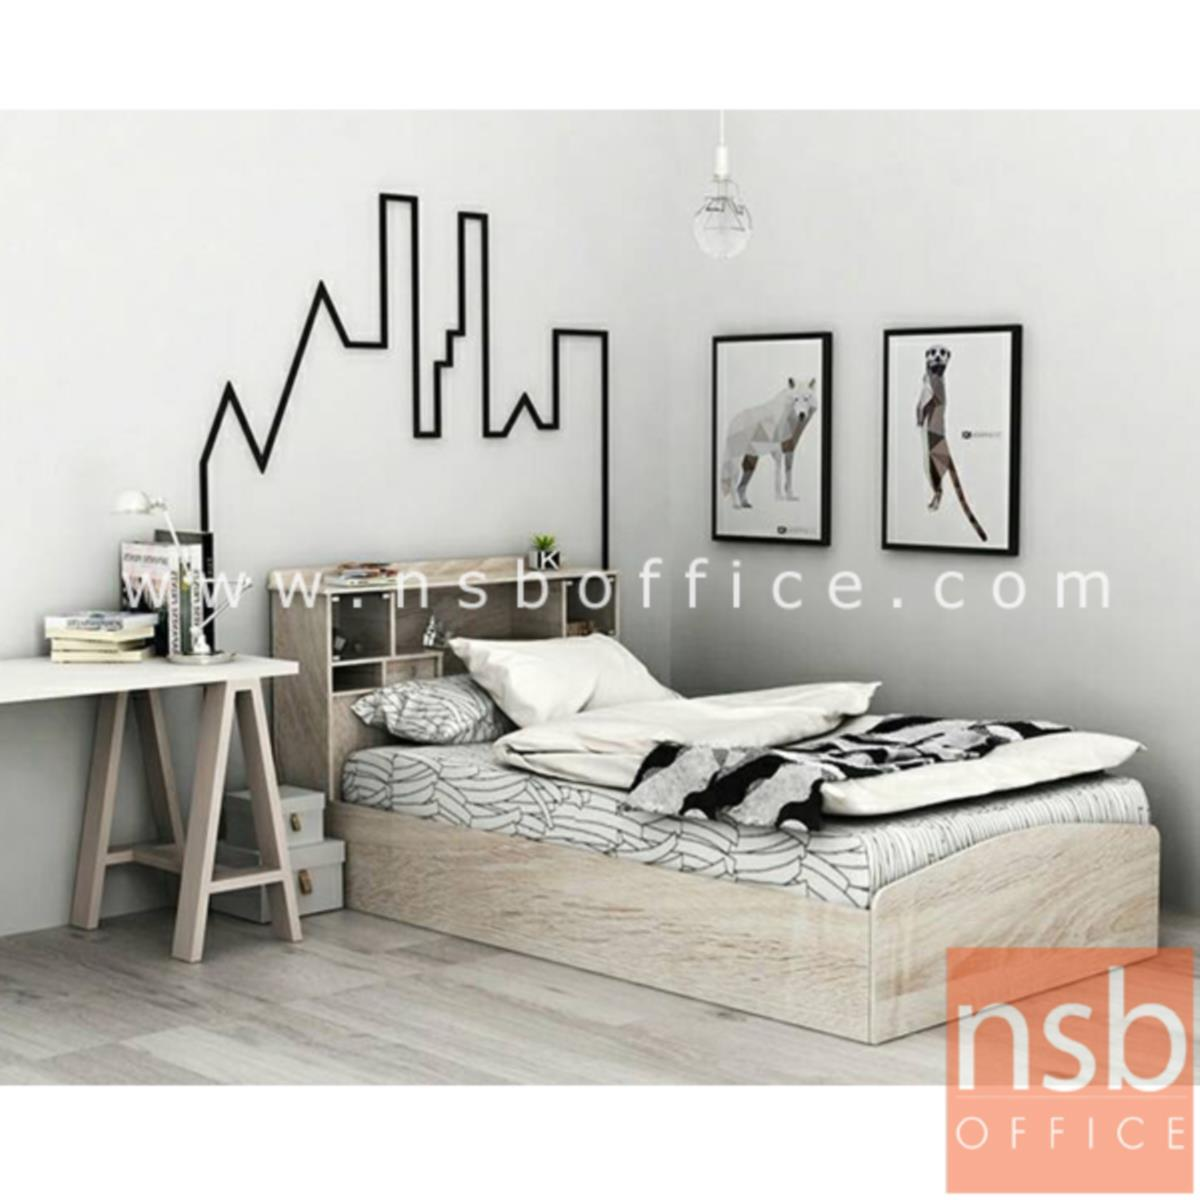 G12A217:เตียงนอนไม้ปาร์ติเกิ้ลบอร์ด มีโคมไฟ  รุ่น Acacia (อคาเซีย)  ขนาด 3.5 ฟุต (ไม่รวมที่นอน)